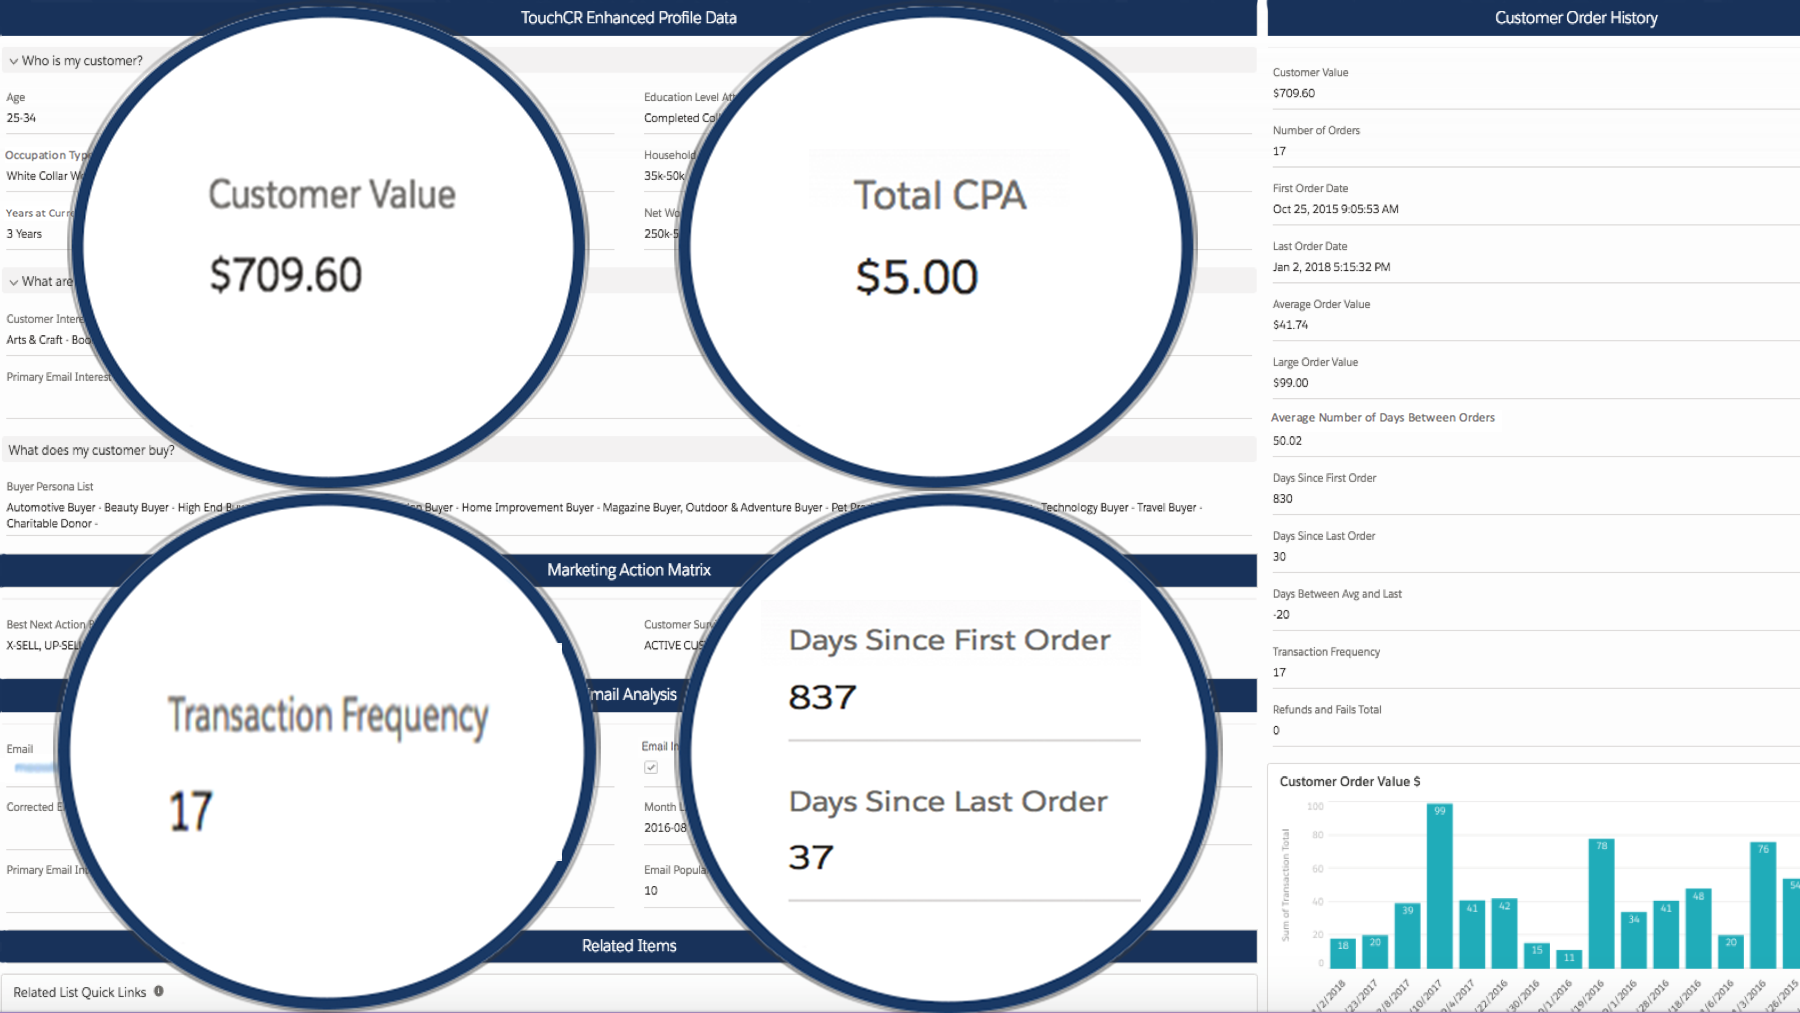 Key Critical Customer Metrics